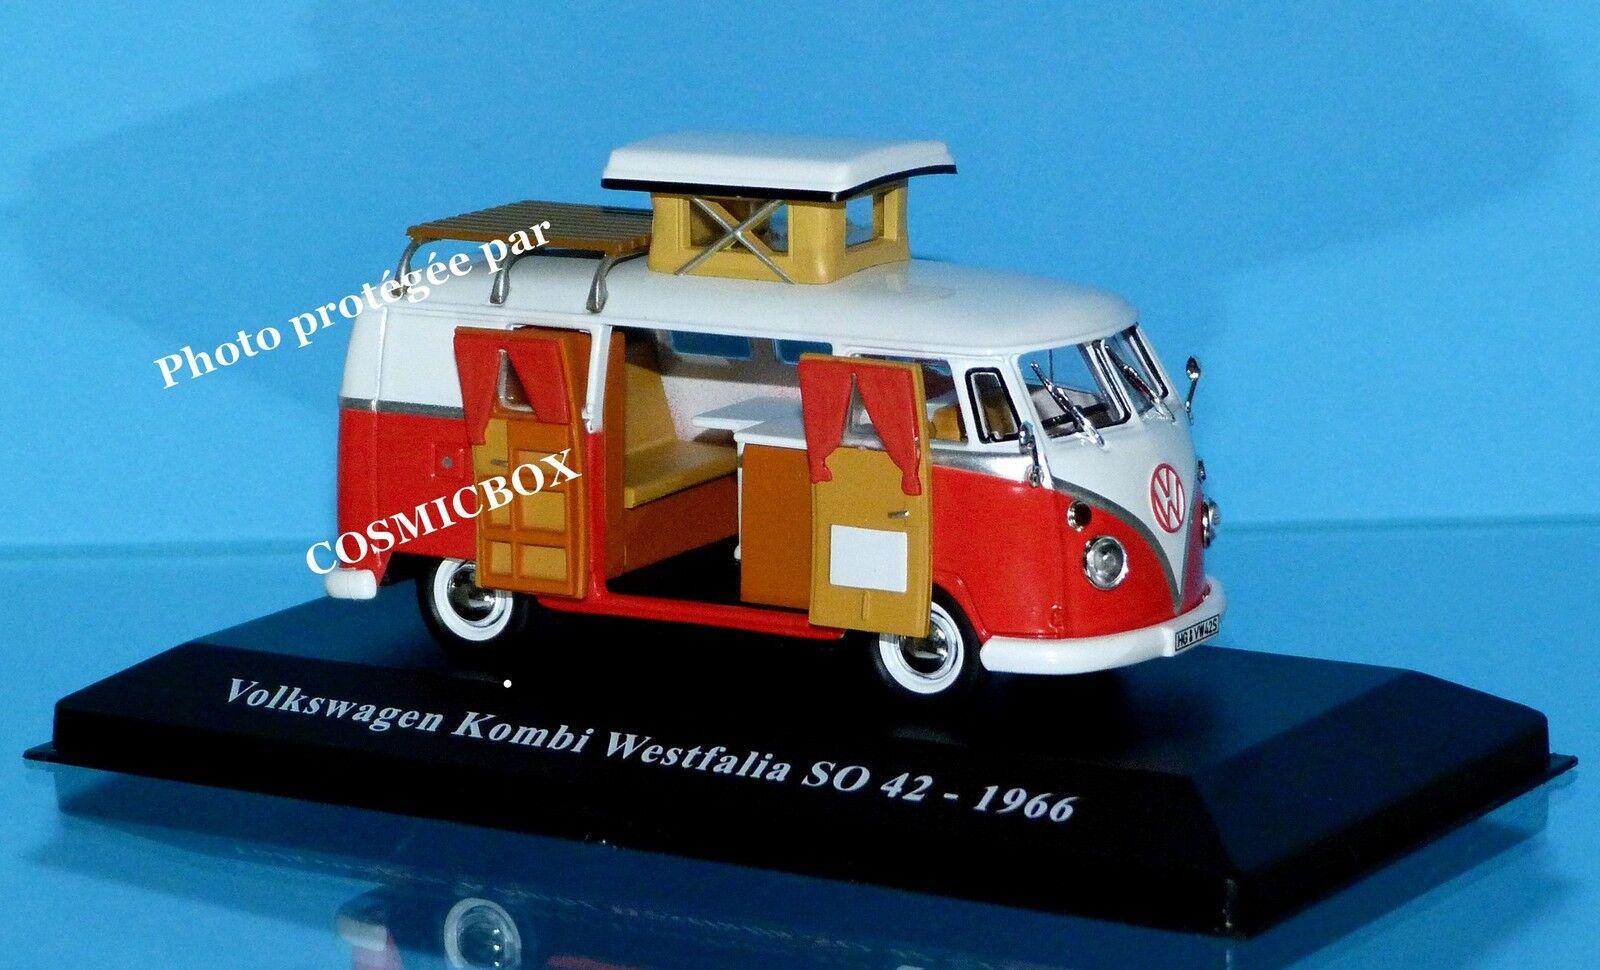 Camping-car VOLKSWAGEN KOMBI WESTFALIA SO 42 vw 1966 combi caravan camper van t5